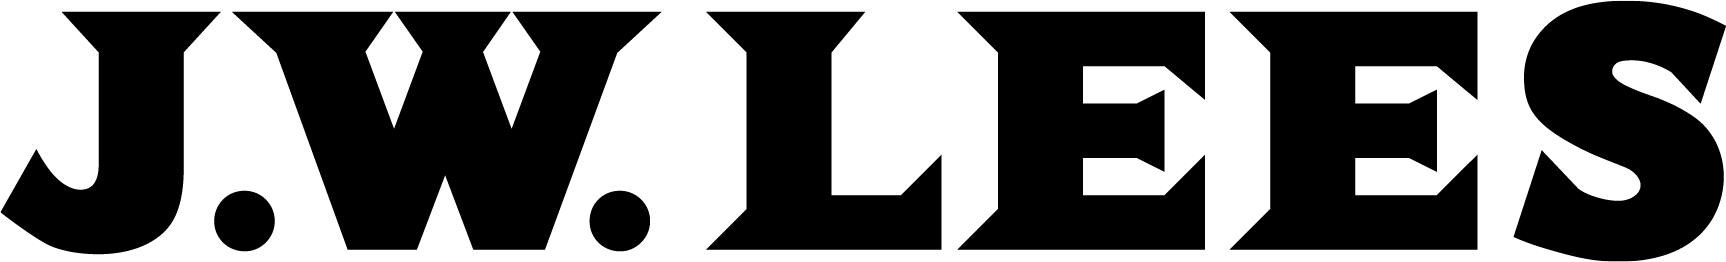 JW Lees Text Logo Black.png